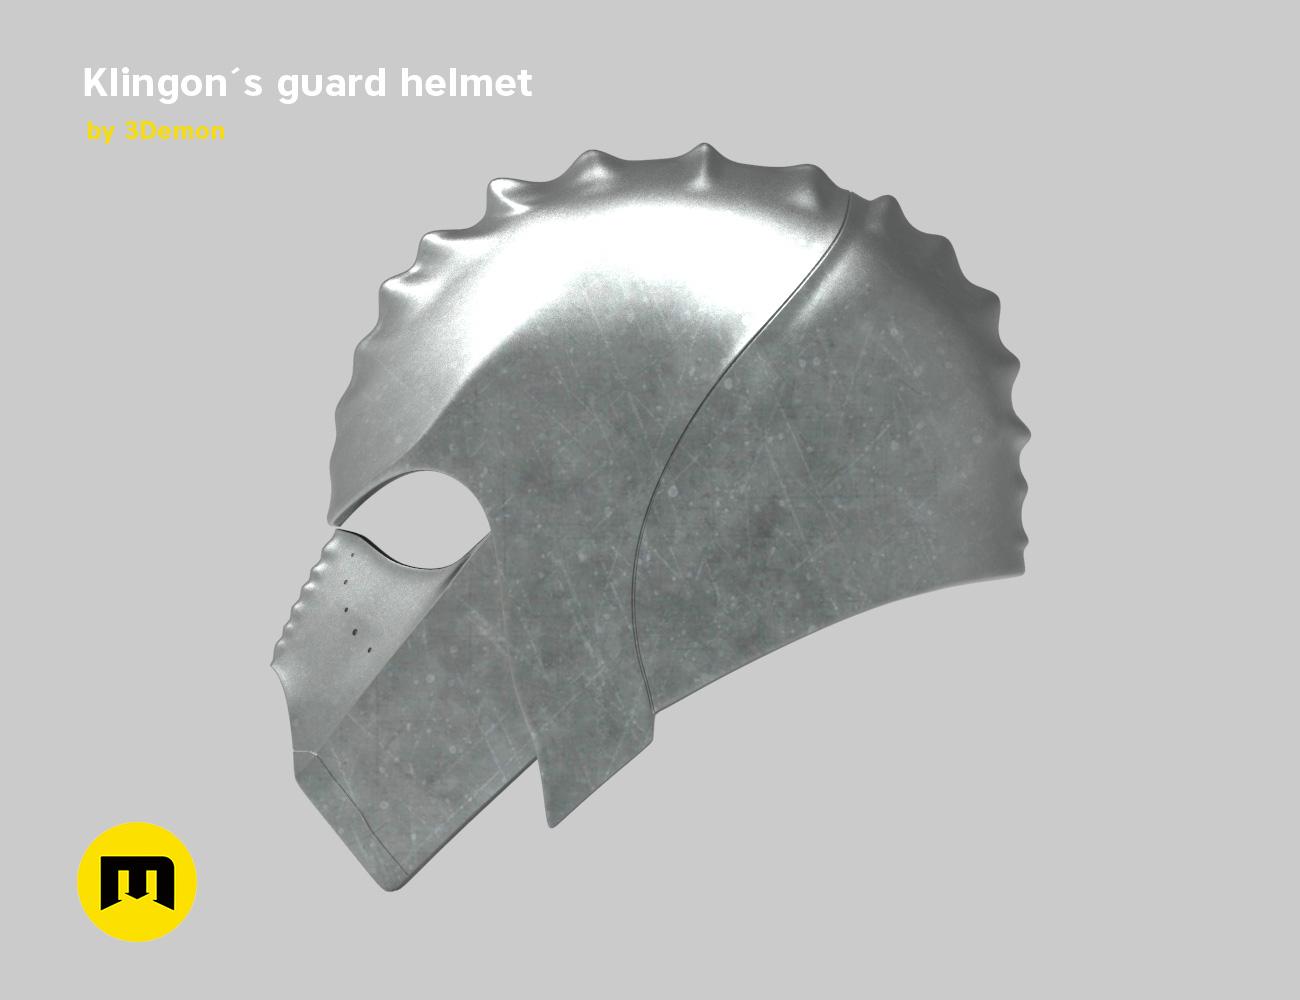 render_klingon_color.54.jpg Download STL file Klingon guard helmet • 3D printer object, 3D-mon